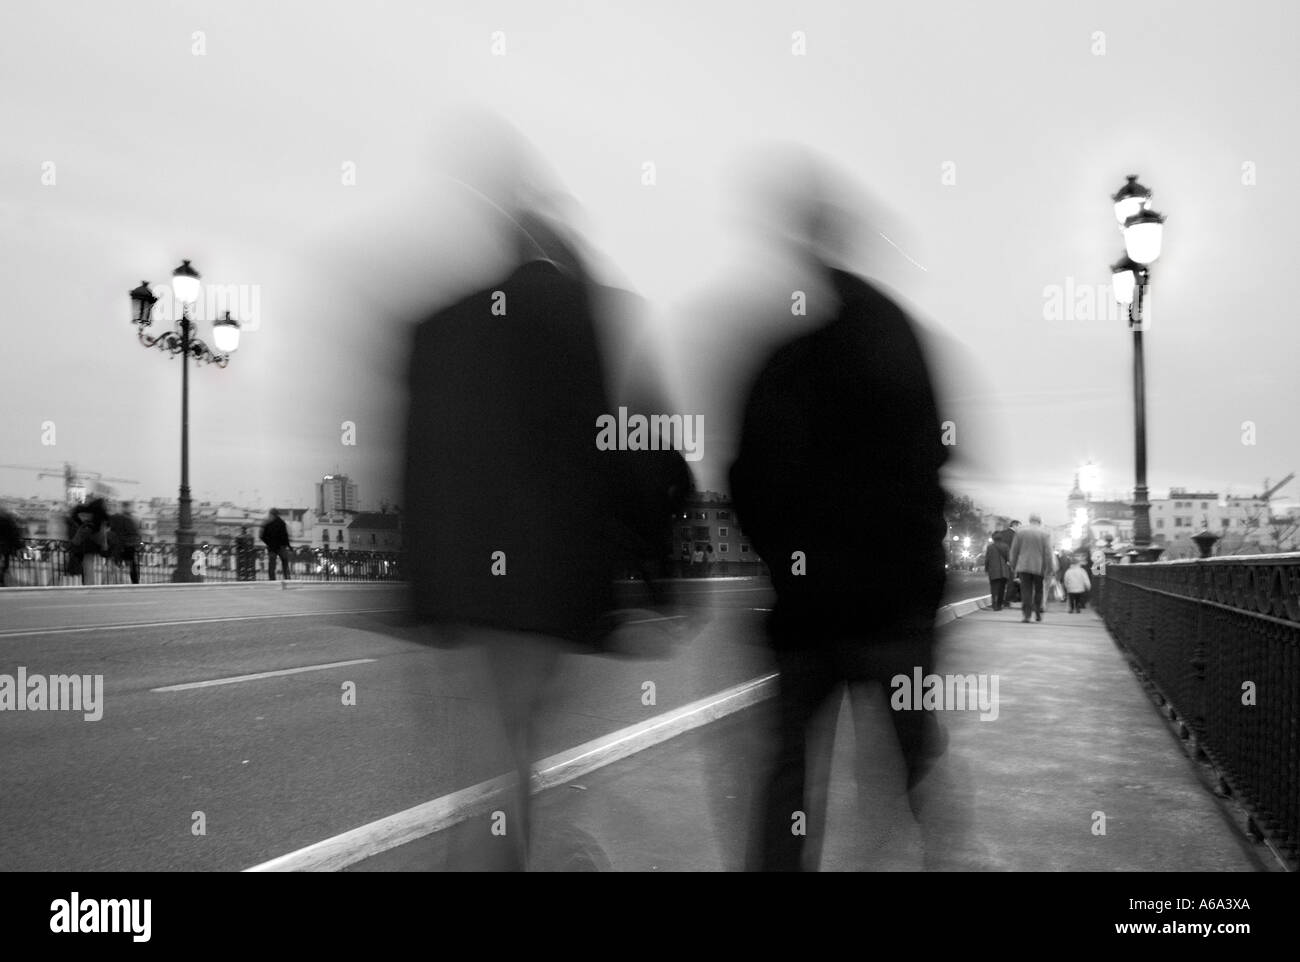 People walking on street at dusk, Seville, Spain - Stock Image